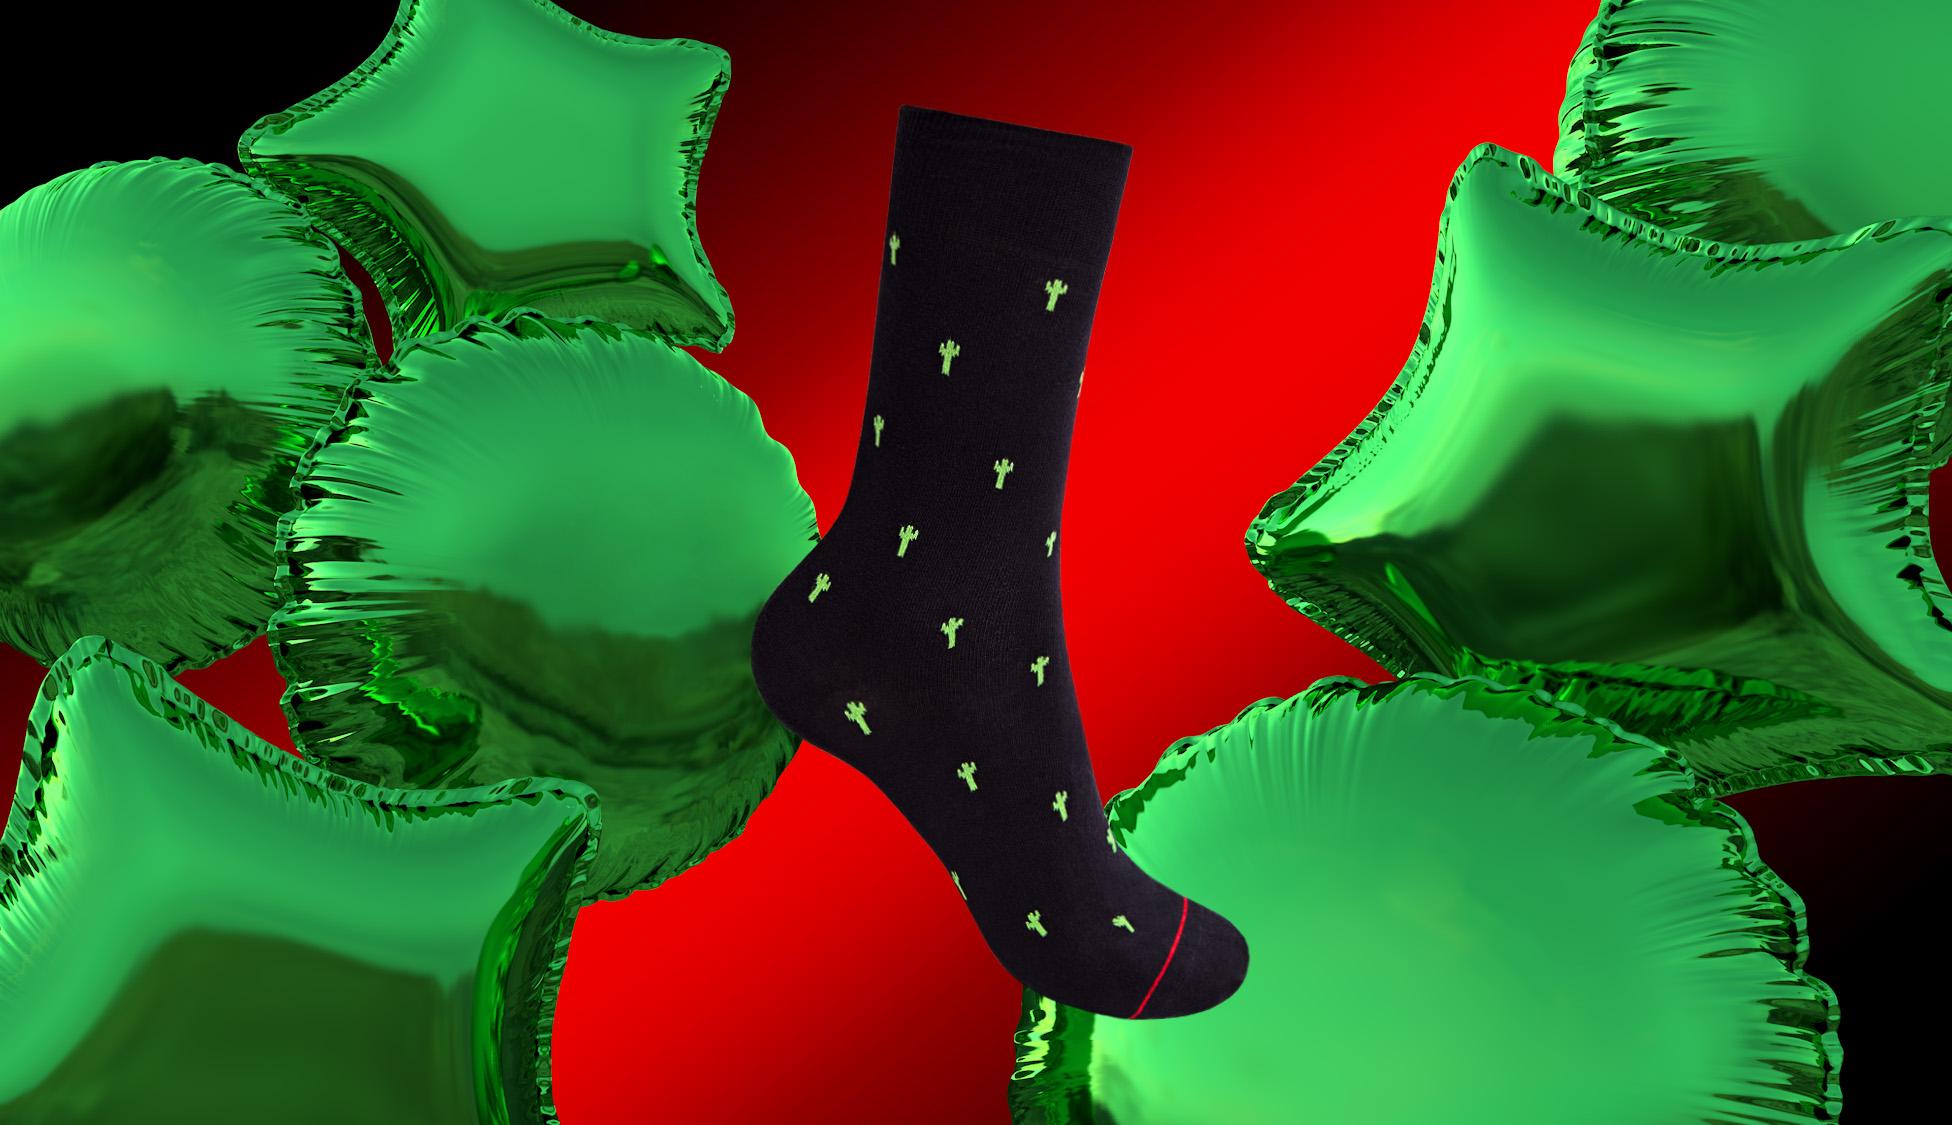 sock2.4.jpg